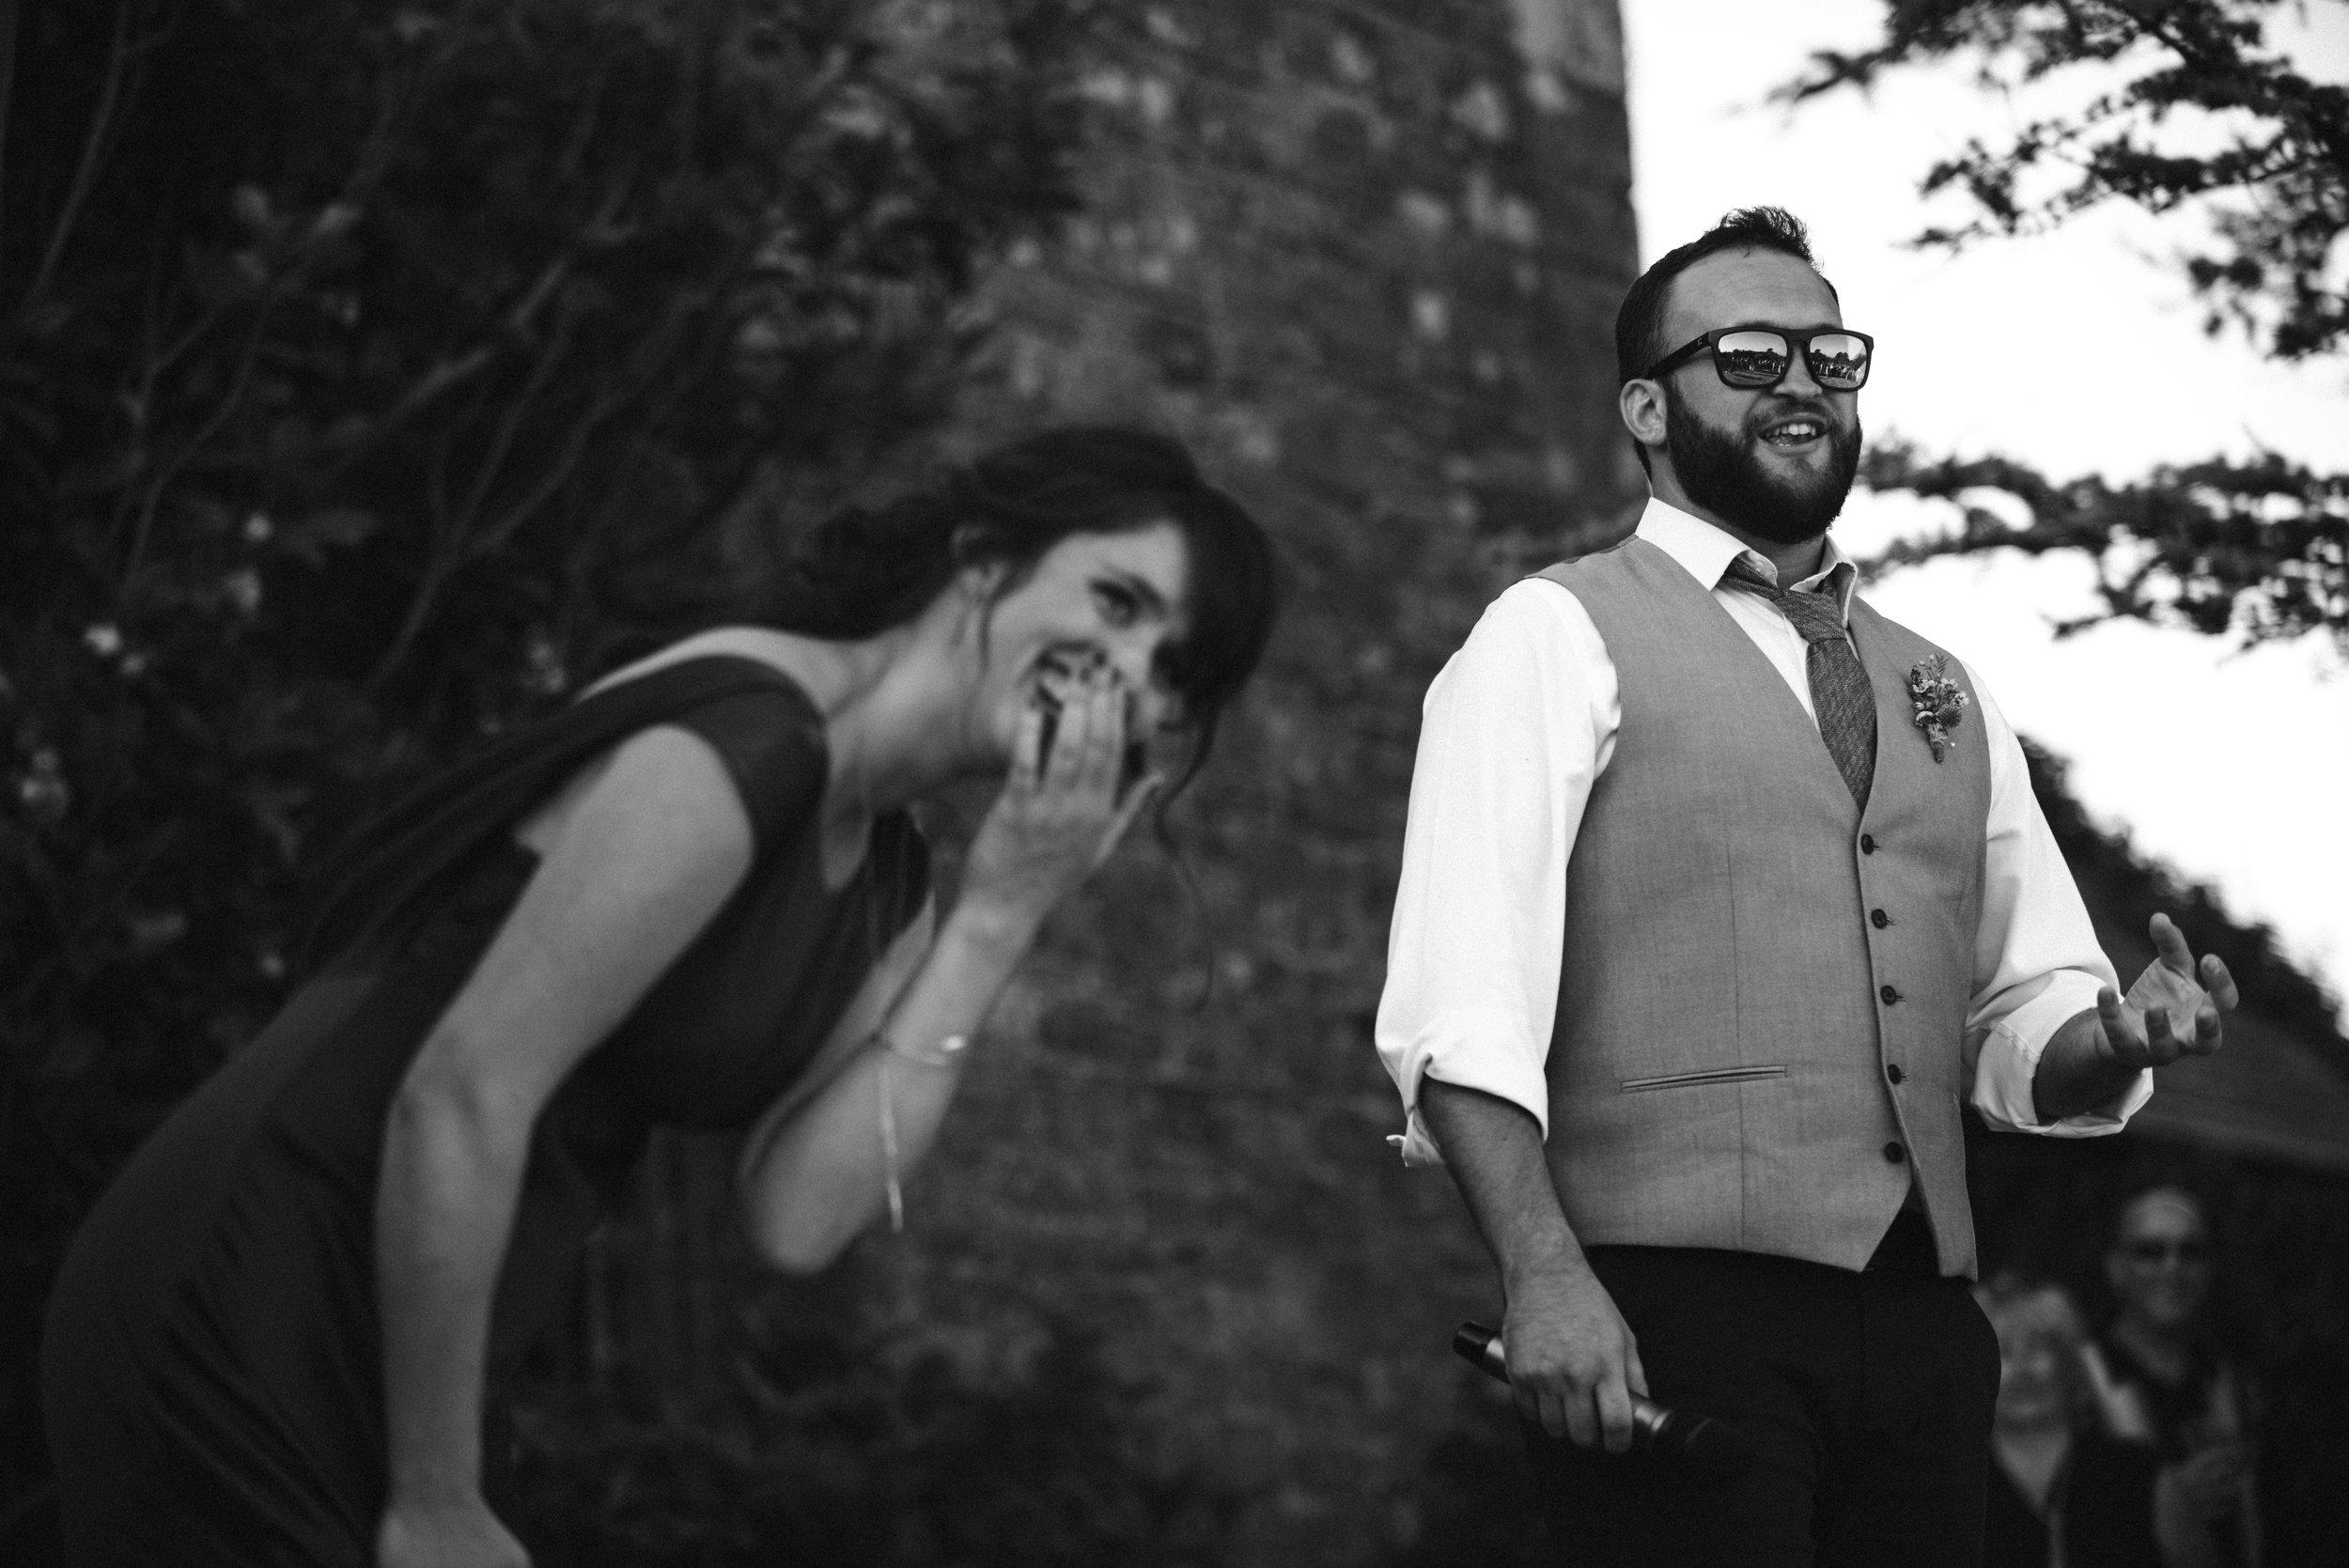 ashbarton-estate-wedding-photographer-mark-shaw-66.jpg